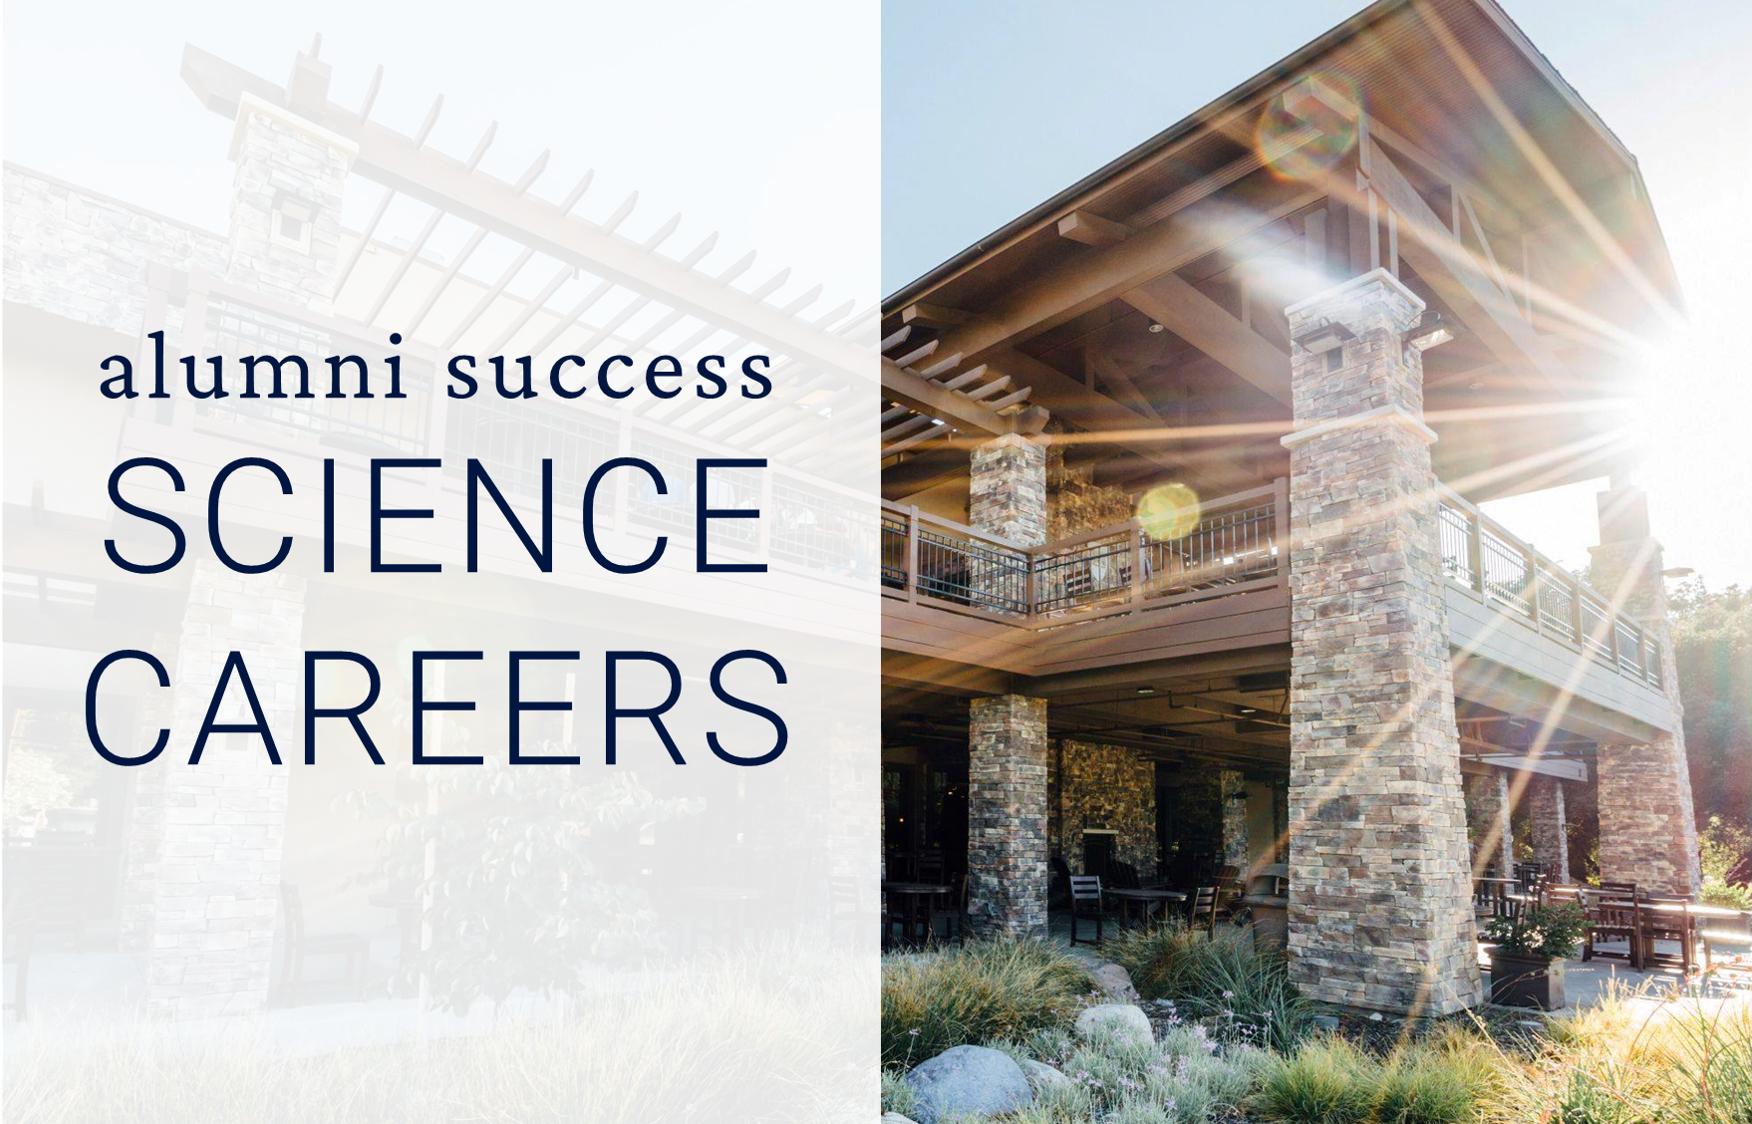 Career Success for Science Alumni